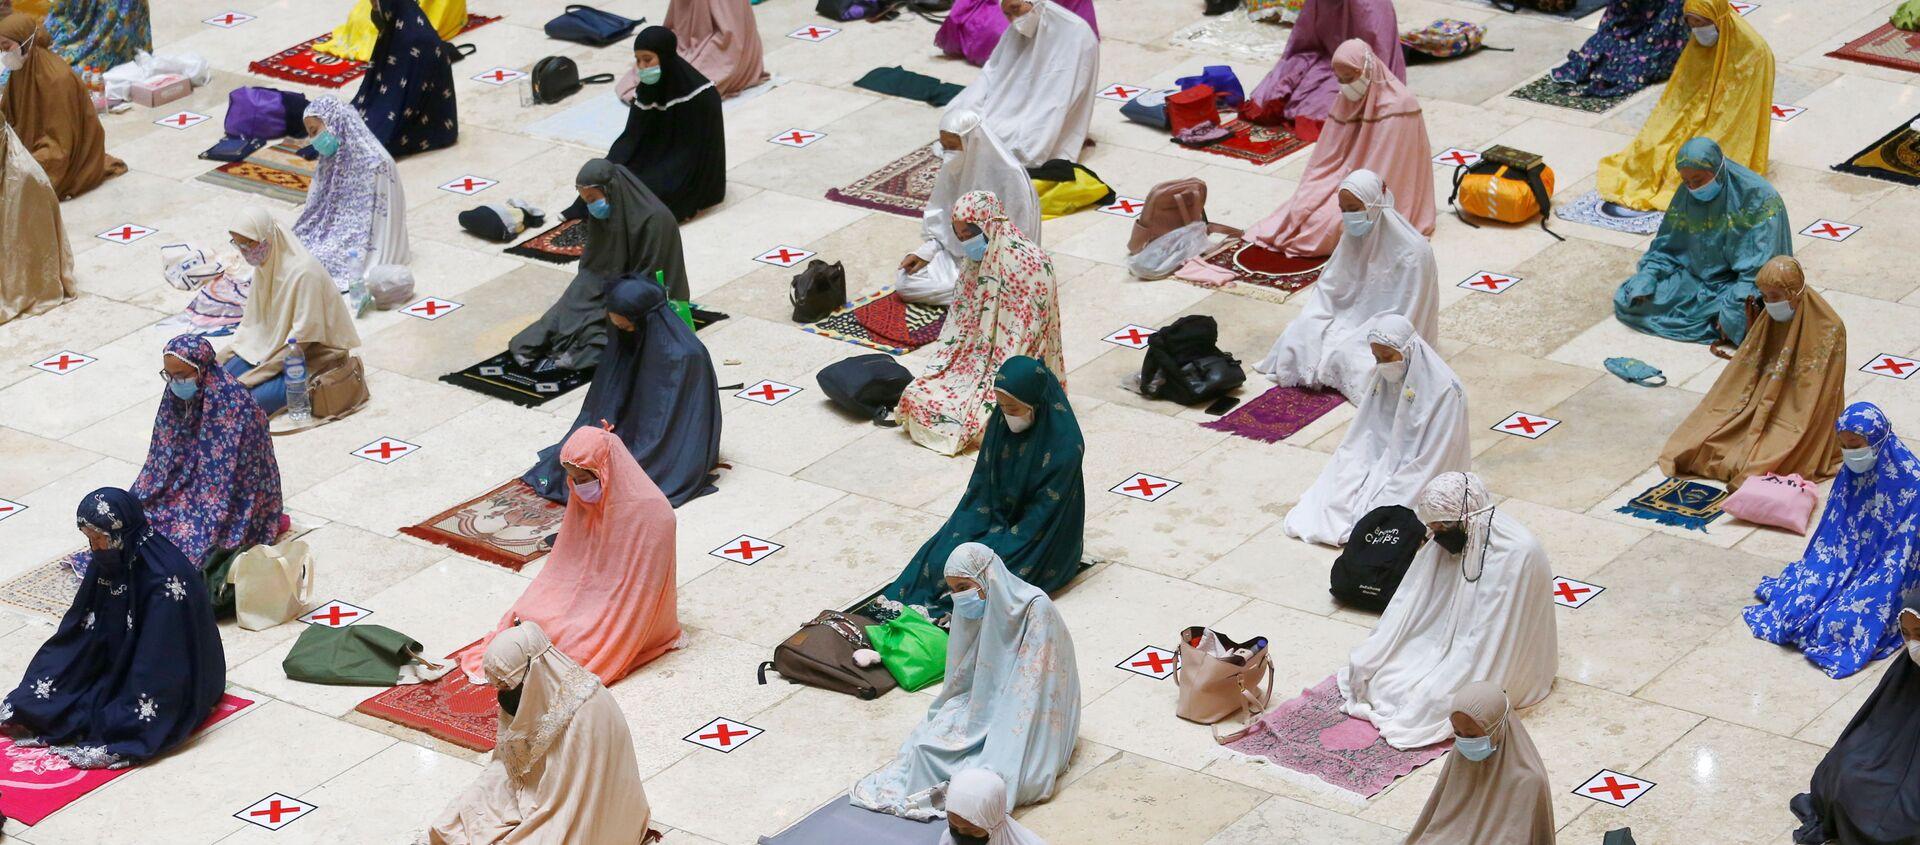 Мусульмане молятся накануне старта священного месяца Рамадан в Индонезии  - Sputnik Азербайджан, 1920, 14.04.2021